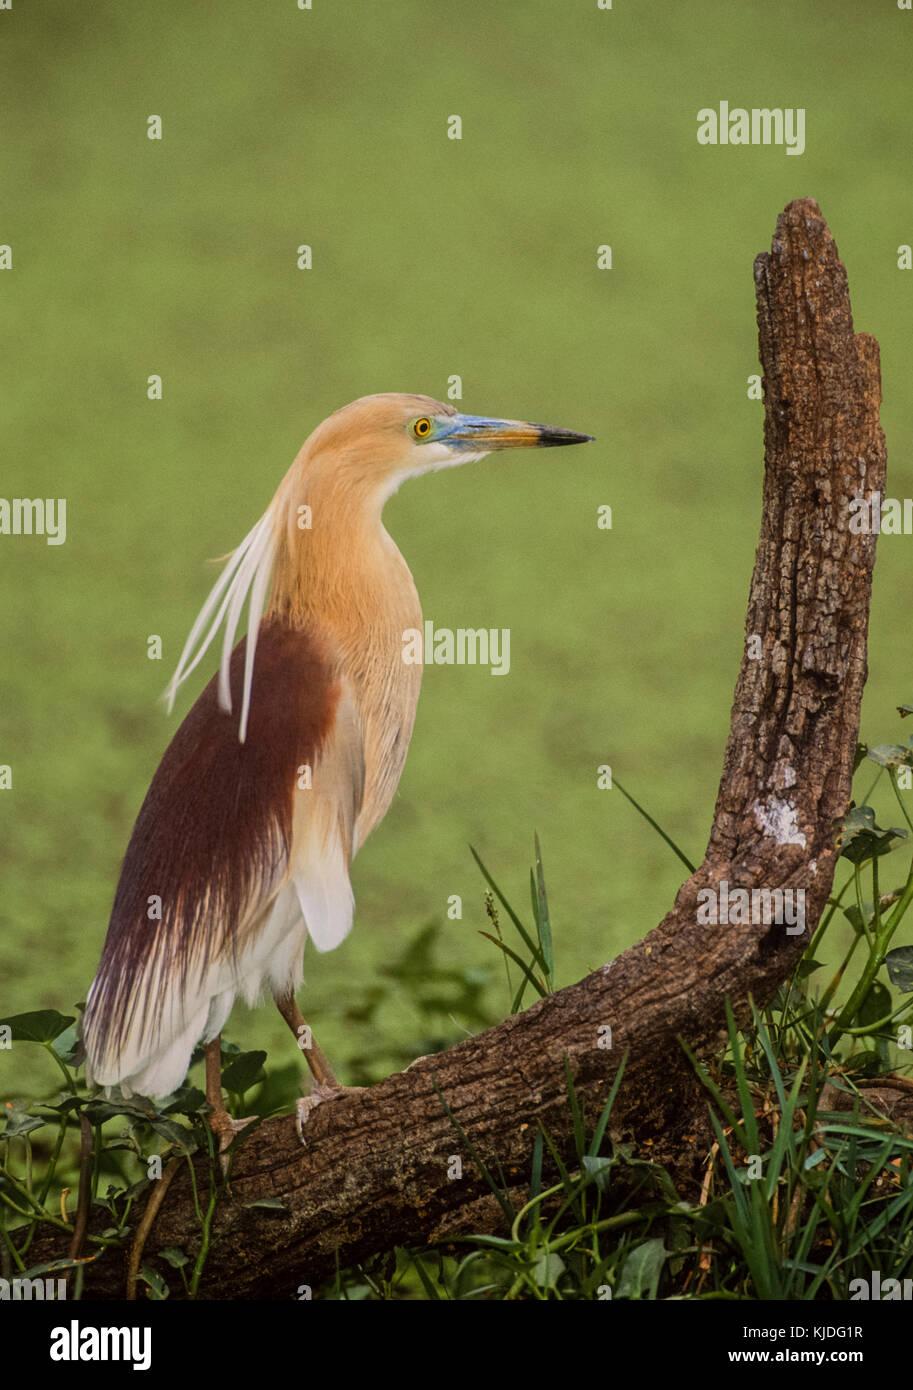 Indian Pond Heron or Paddybird , (Ardeola grayii), in breeding plumage in wetlands, Keoladeo Ghana National Park, - Stock Image